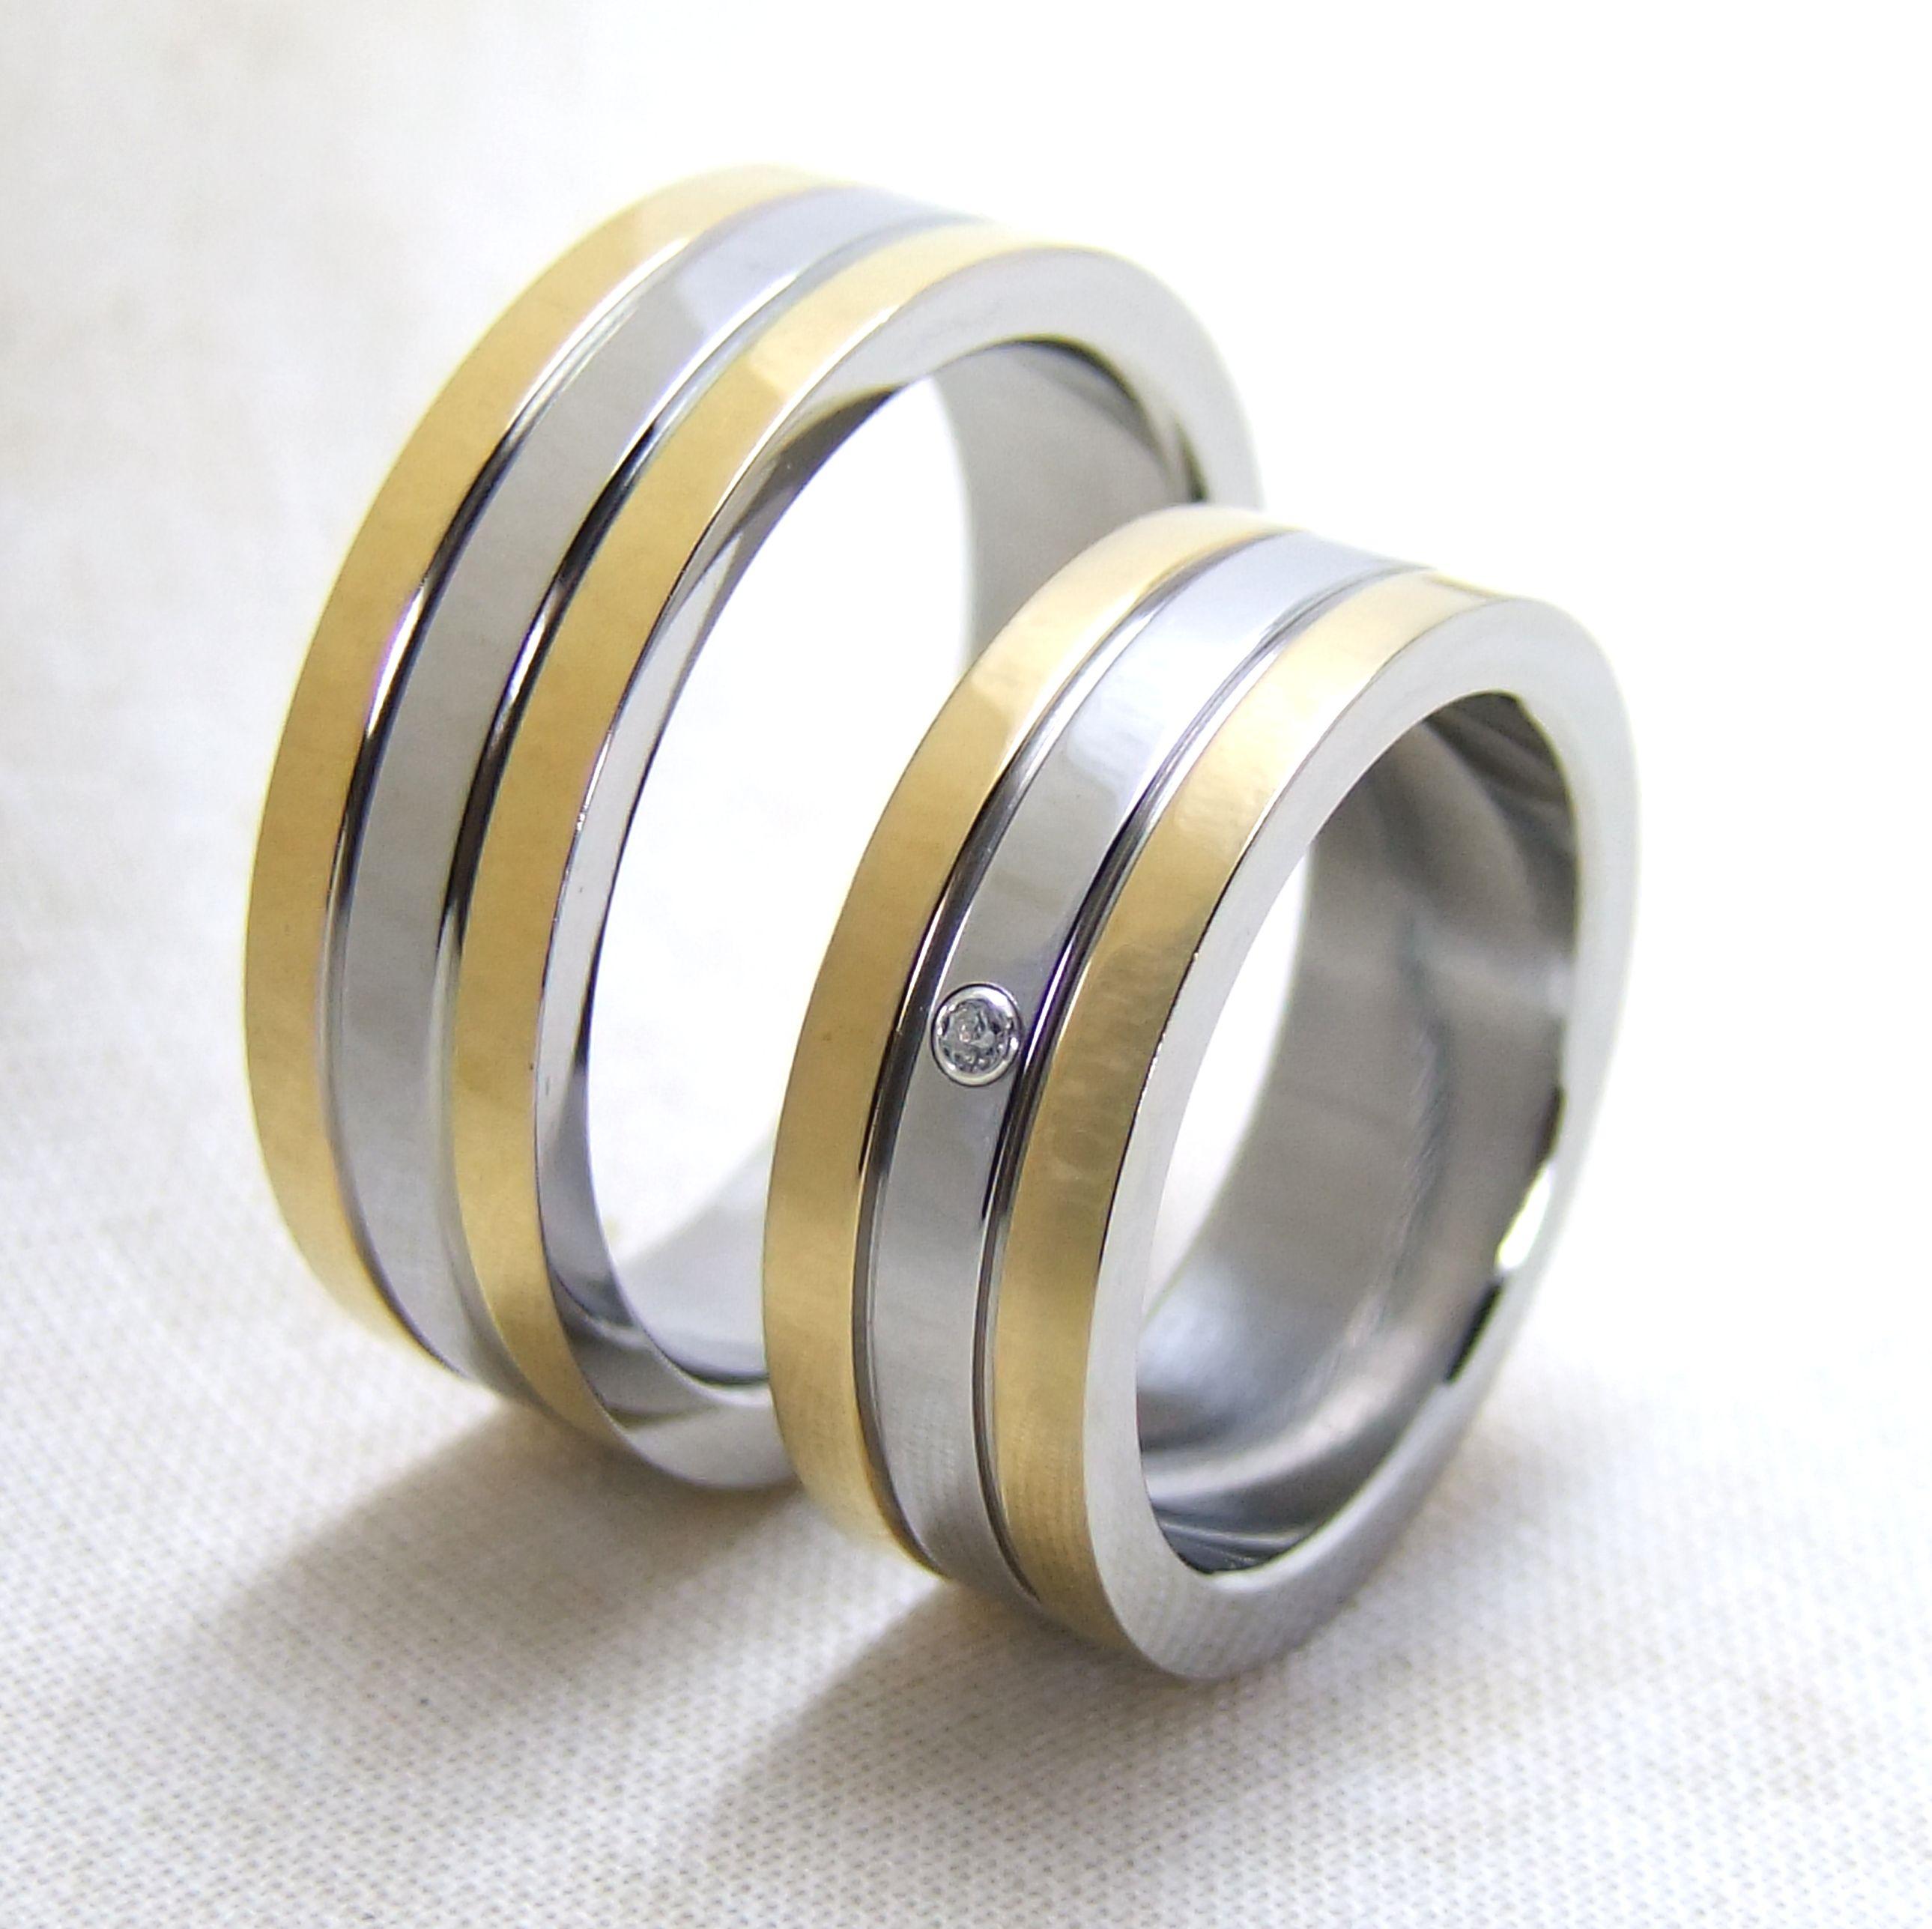 ... Verlobungsring e Trauringe Hochzeitsringe Partnerringe 7 mm & Gravur